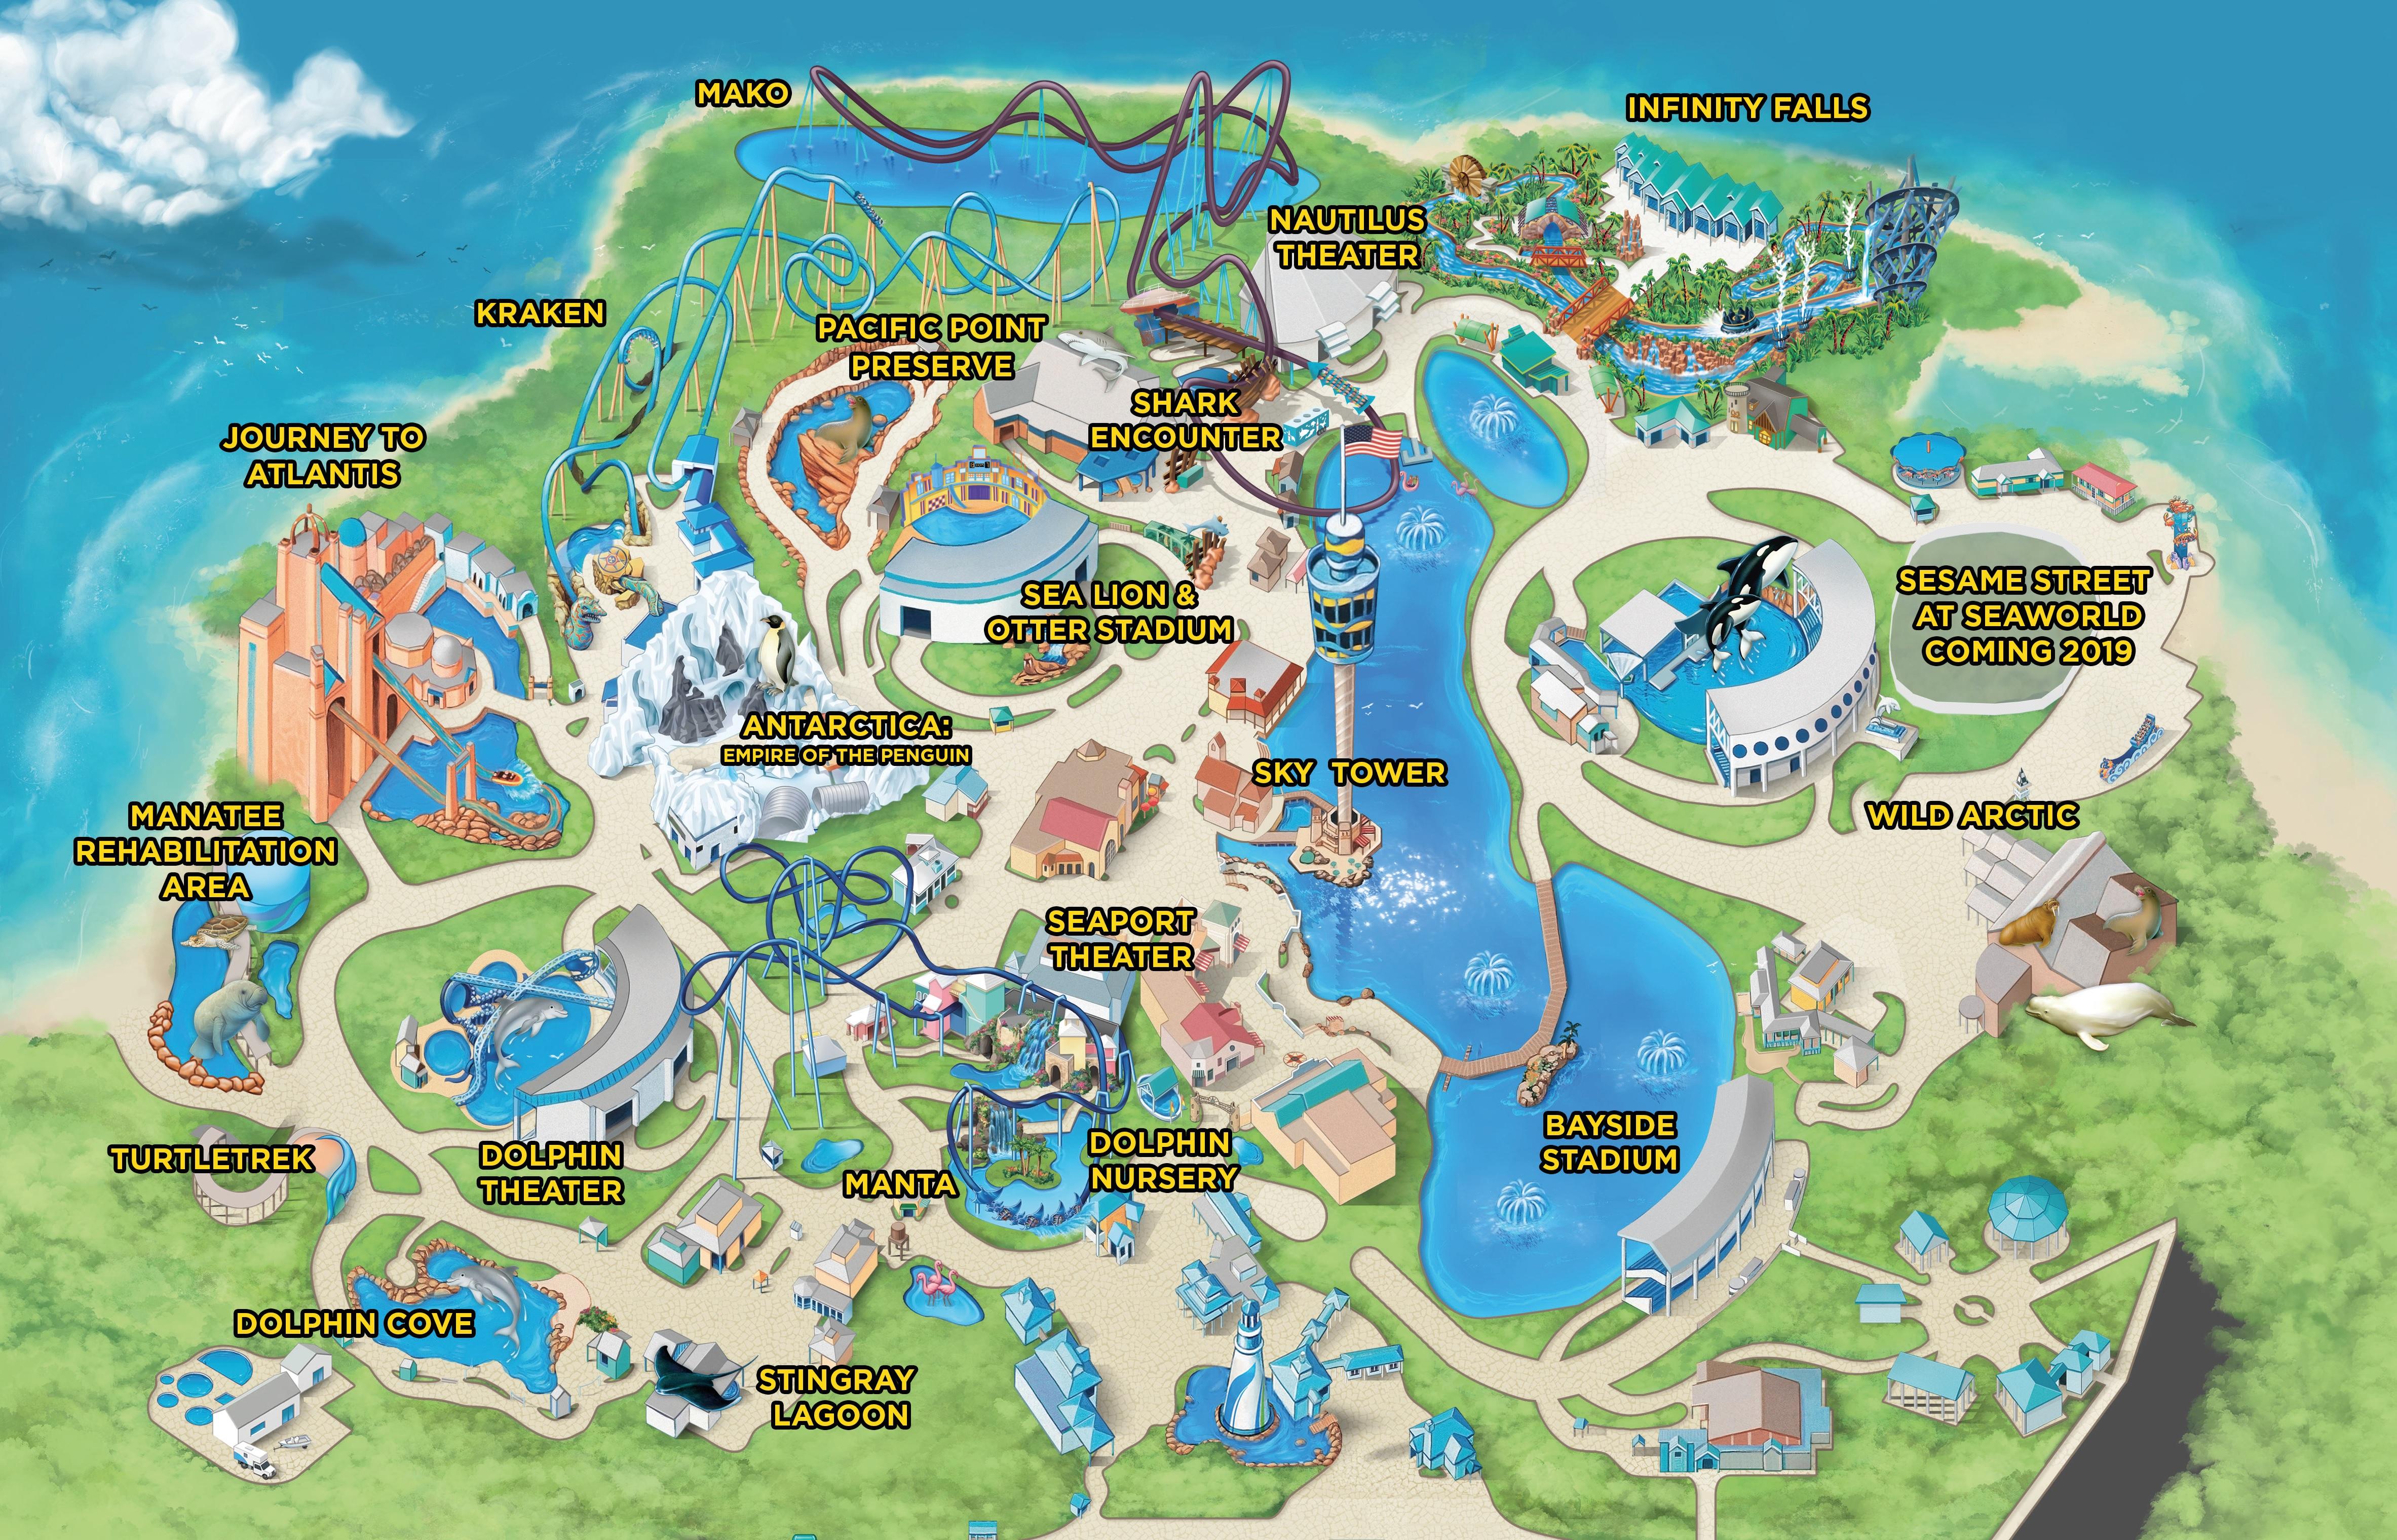 Seaworld Parks & Entertainment | Know Before You Go | Seaworld - Seaworld Map Orlando Florida